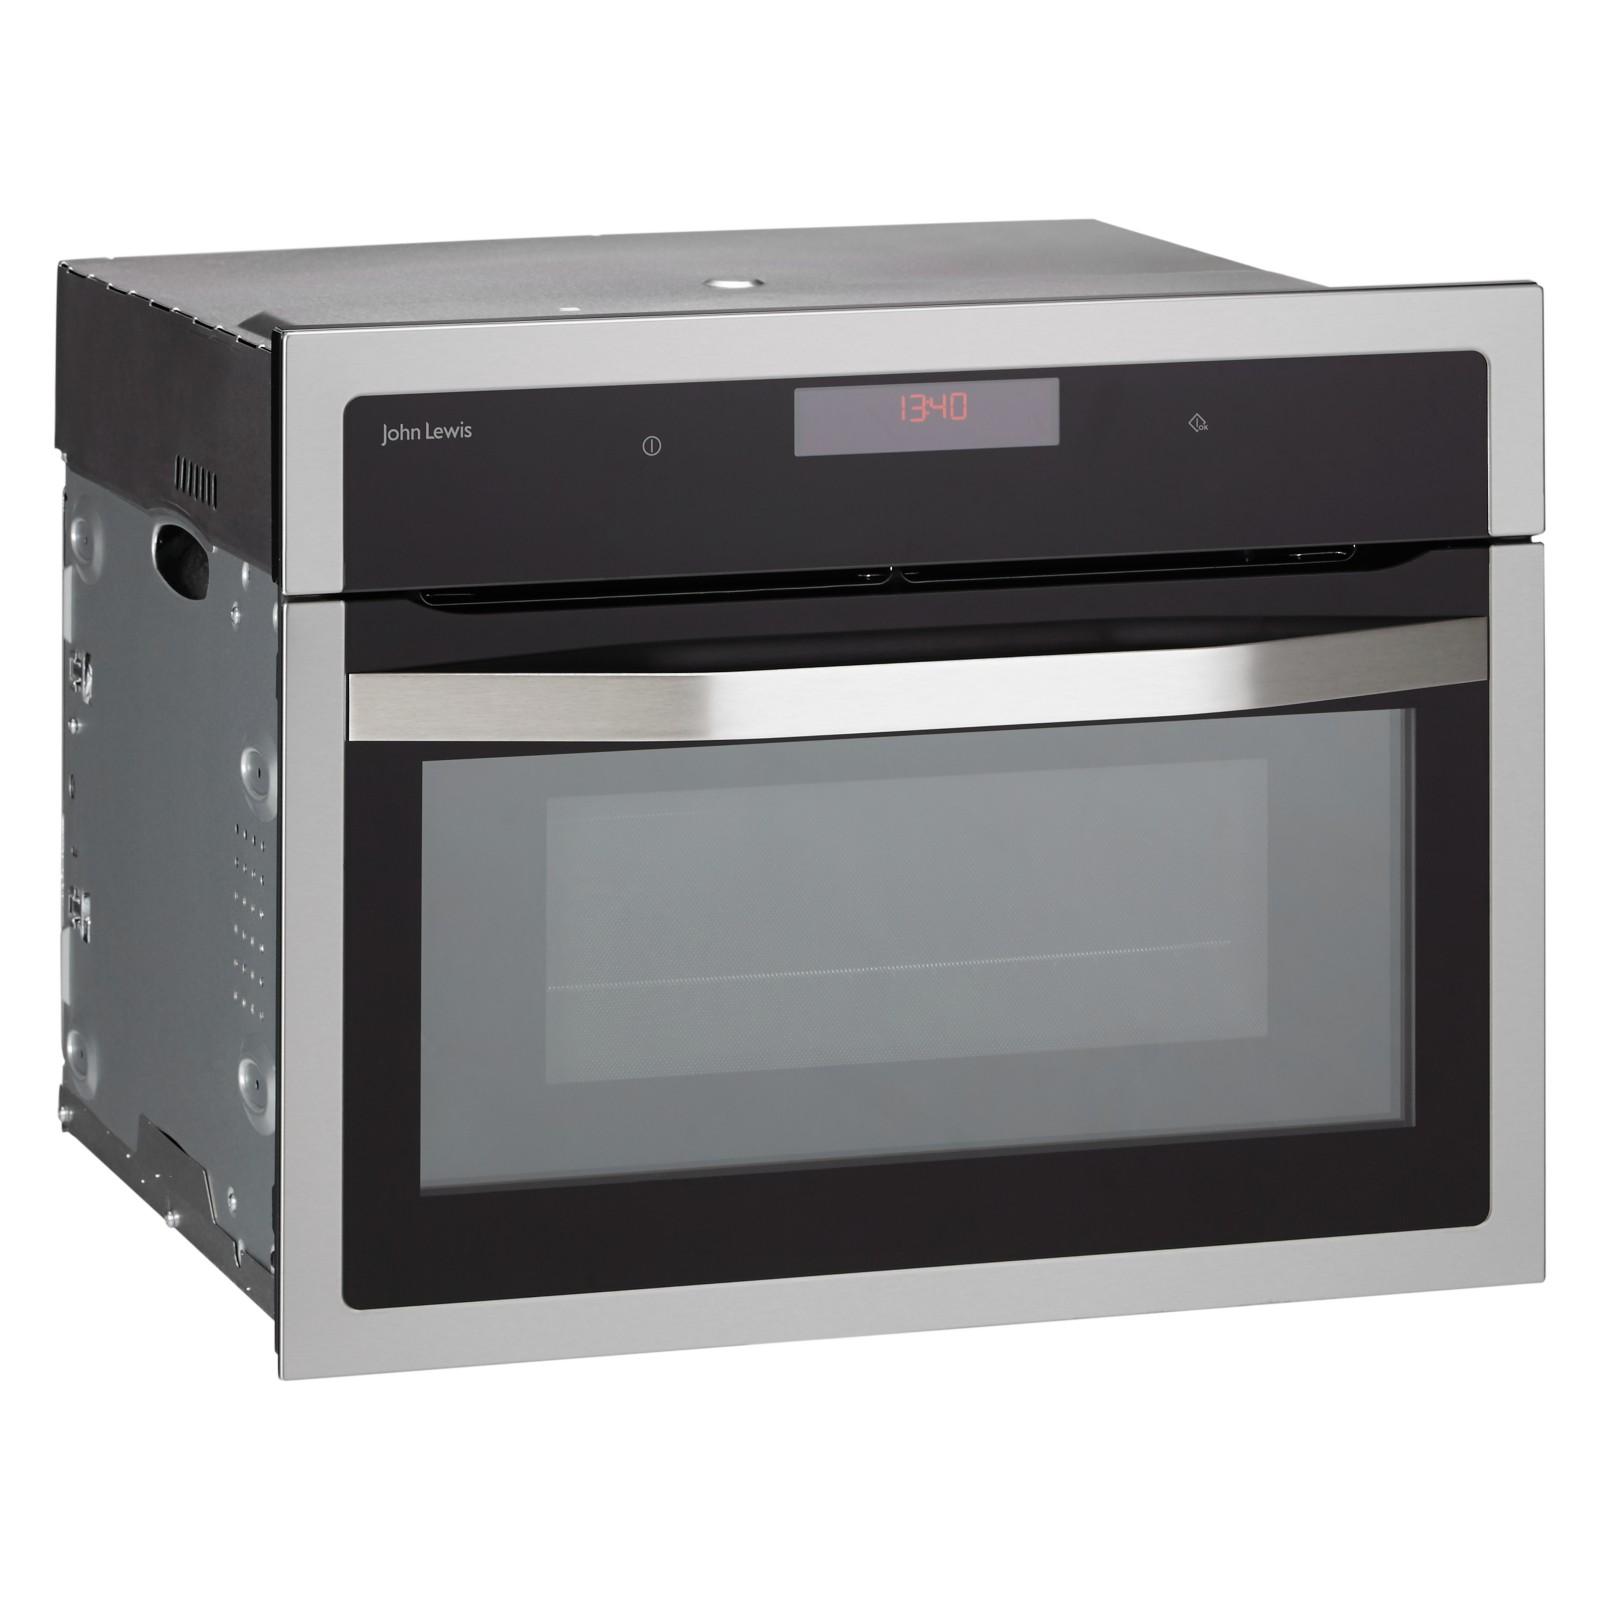 John Lewis JLBIMW03 Built-In Microwave